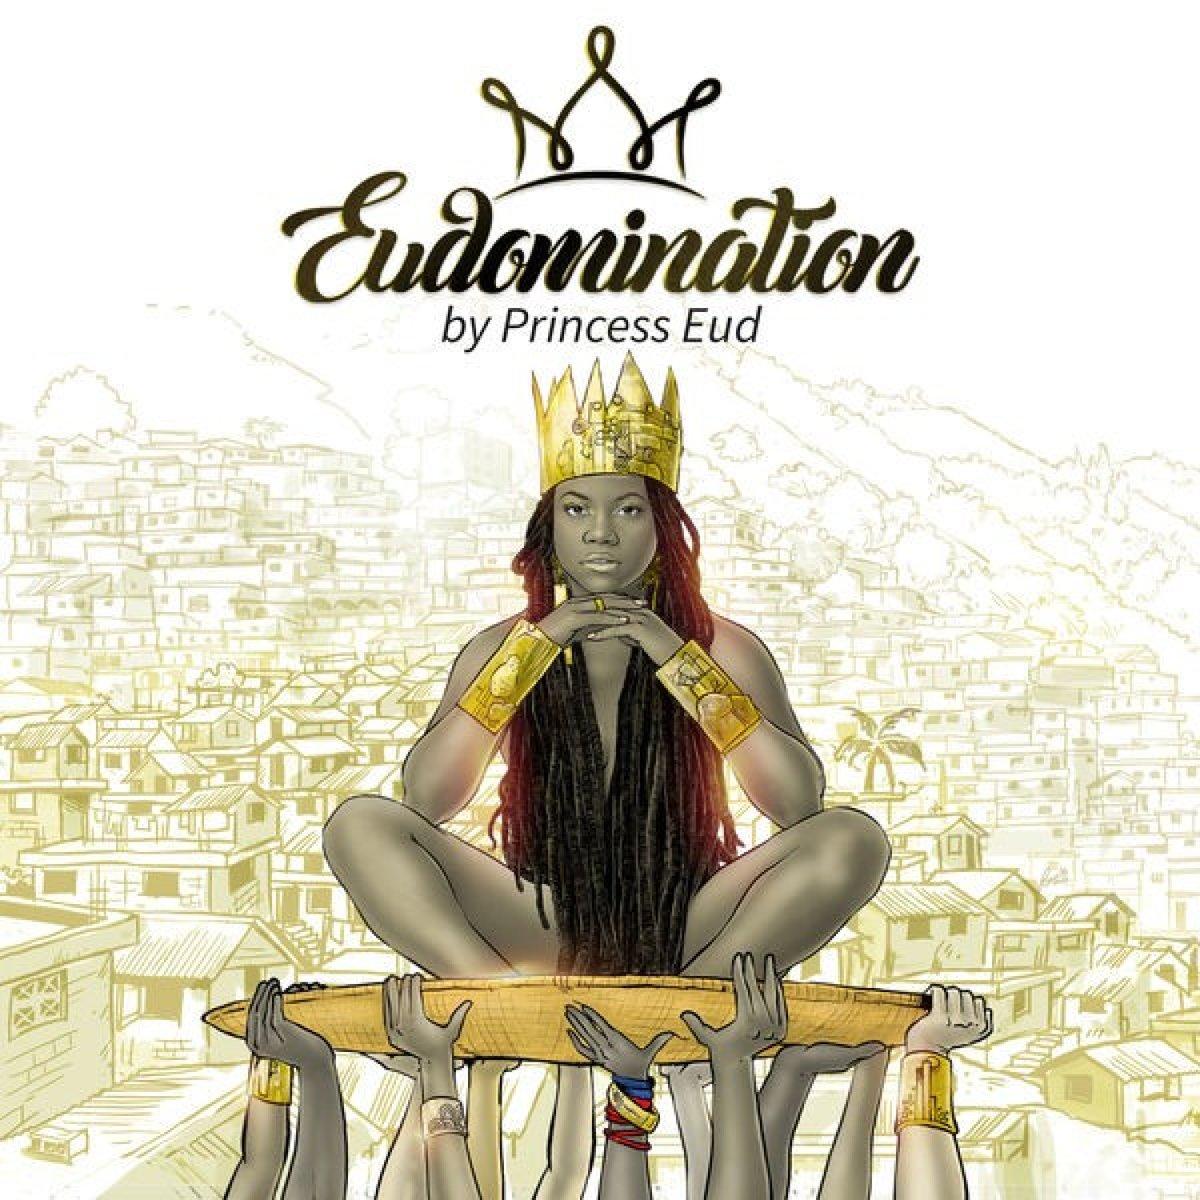 RADIO CAPITOLE on Twitter: #webradio  #Info #Music #Information #Actu #Actualite #Media #faitsdivers #Justice #PaysBasque #Radio #Pau #Bearn #journal @radiocapitole  : #Ecoute ce Titre #Princess Eud #Caribbean Love  #Princess Eud - Caribbean Love…